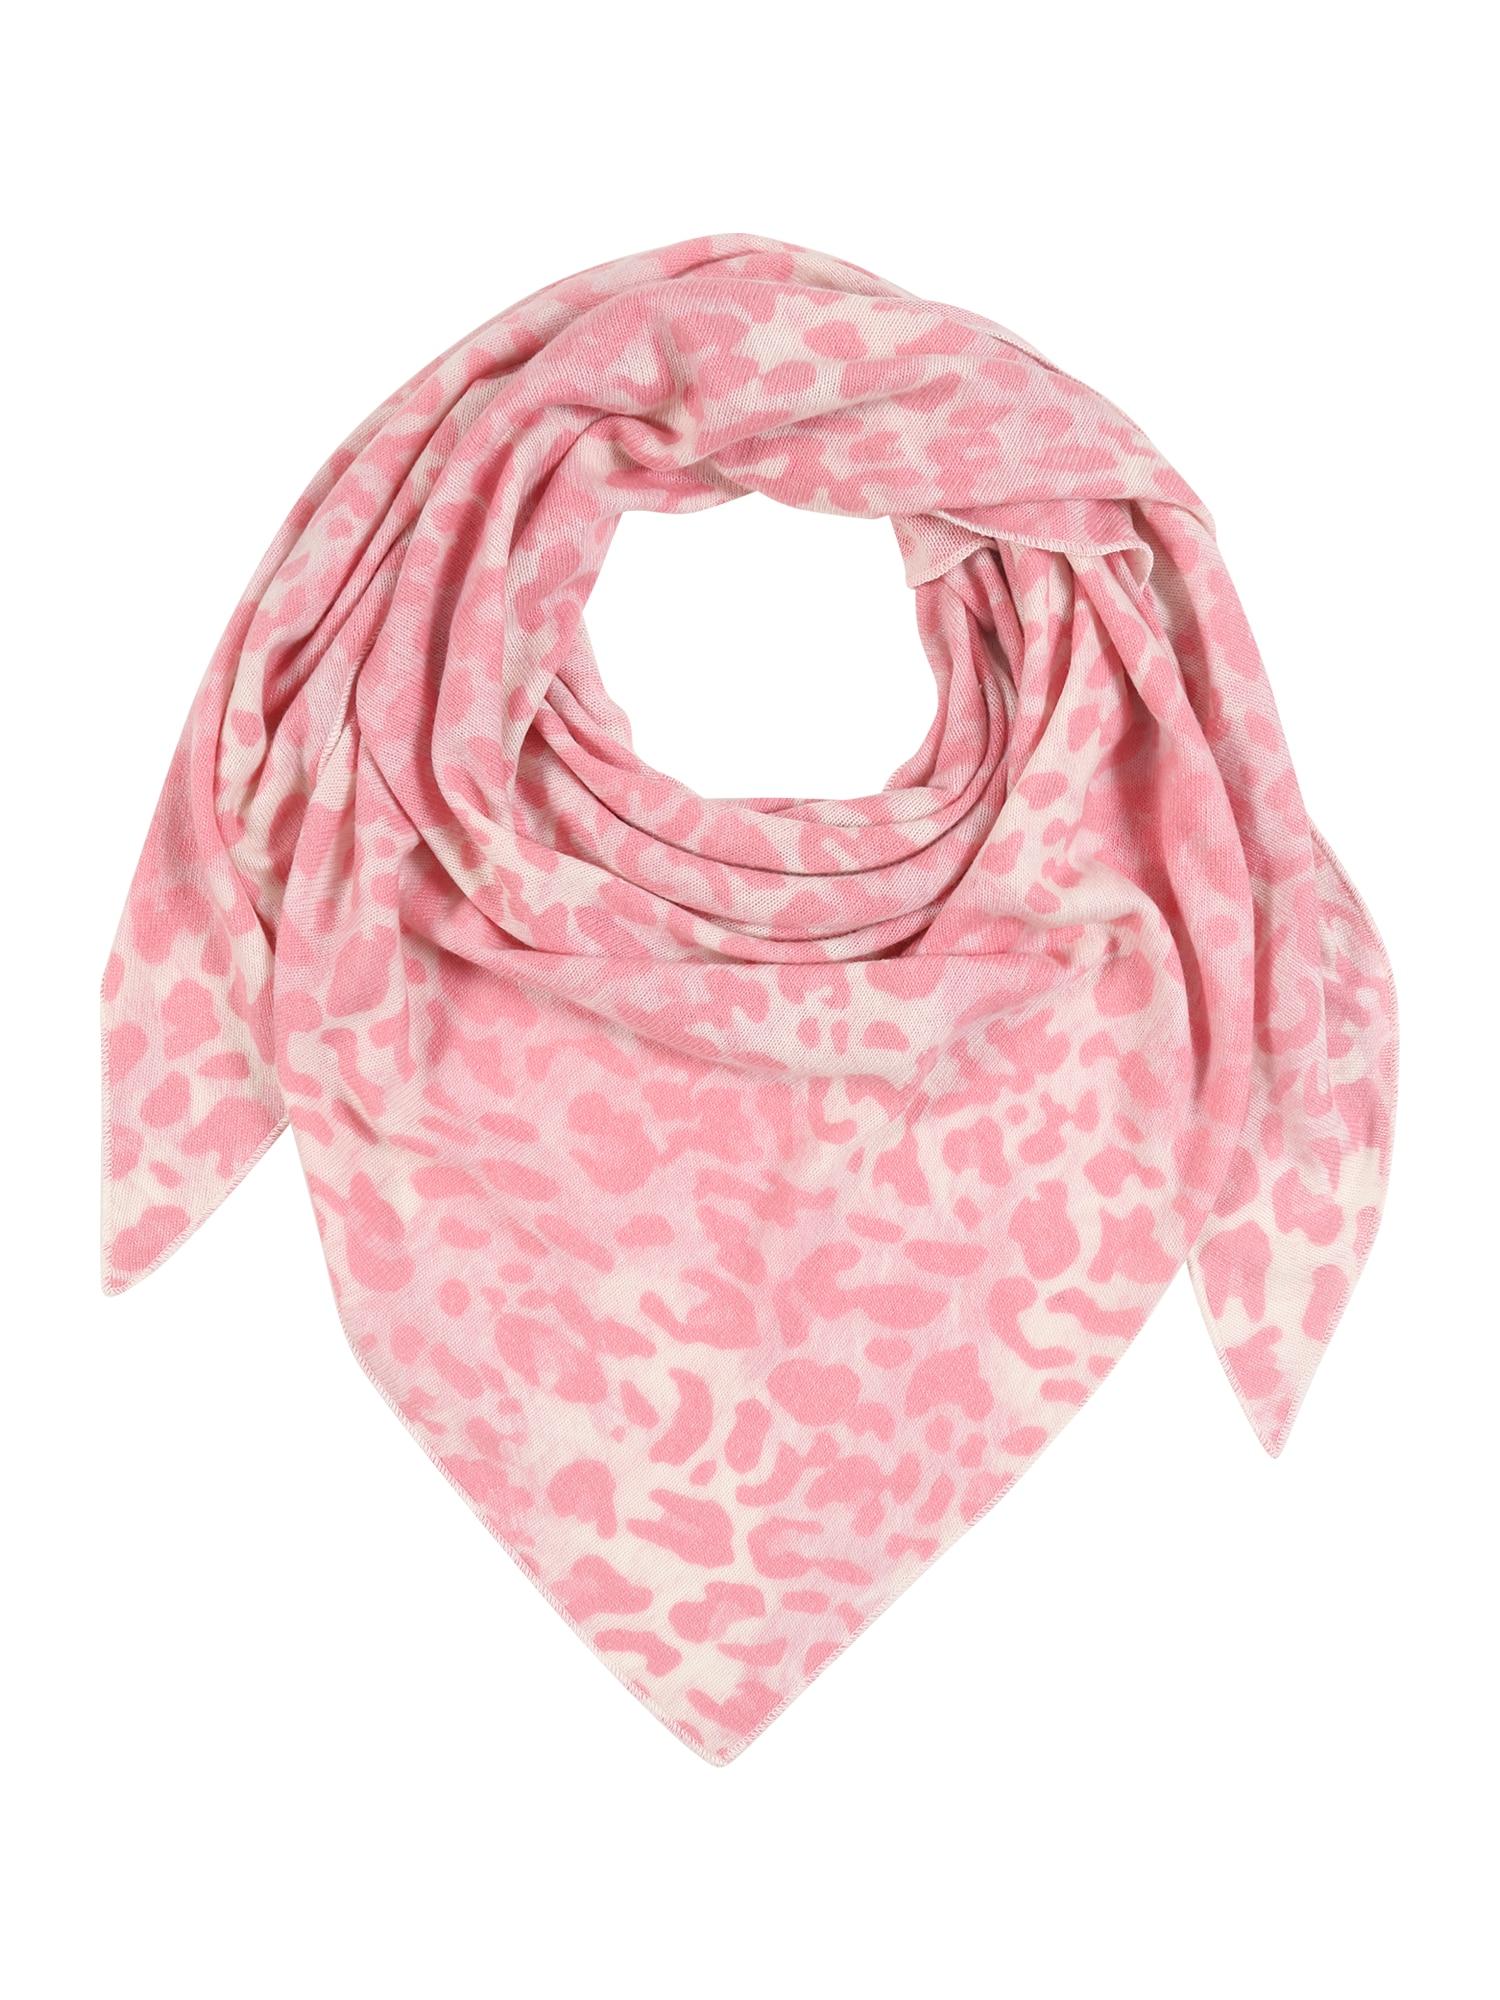 Zwillingsherz Skara ' Leo Pink ' rožių spalva